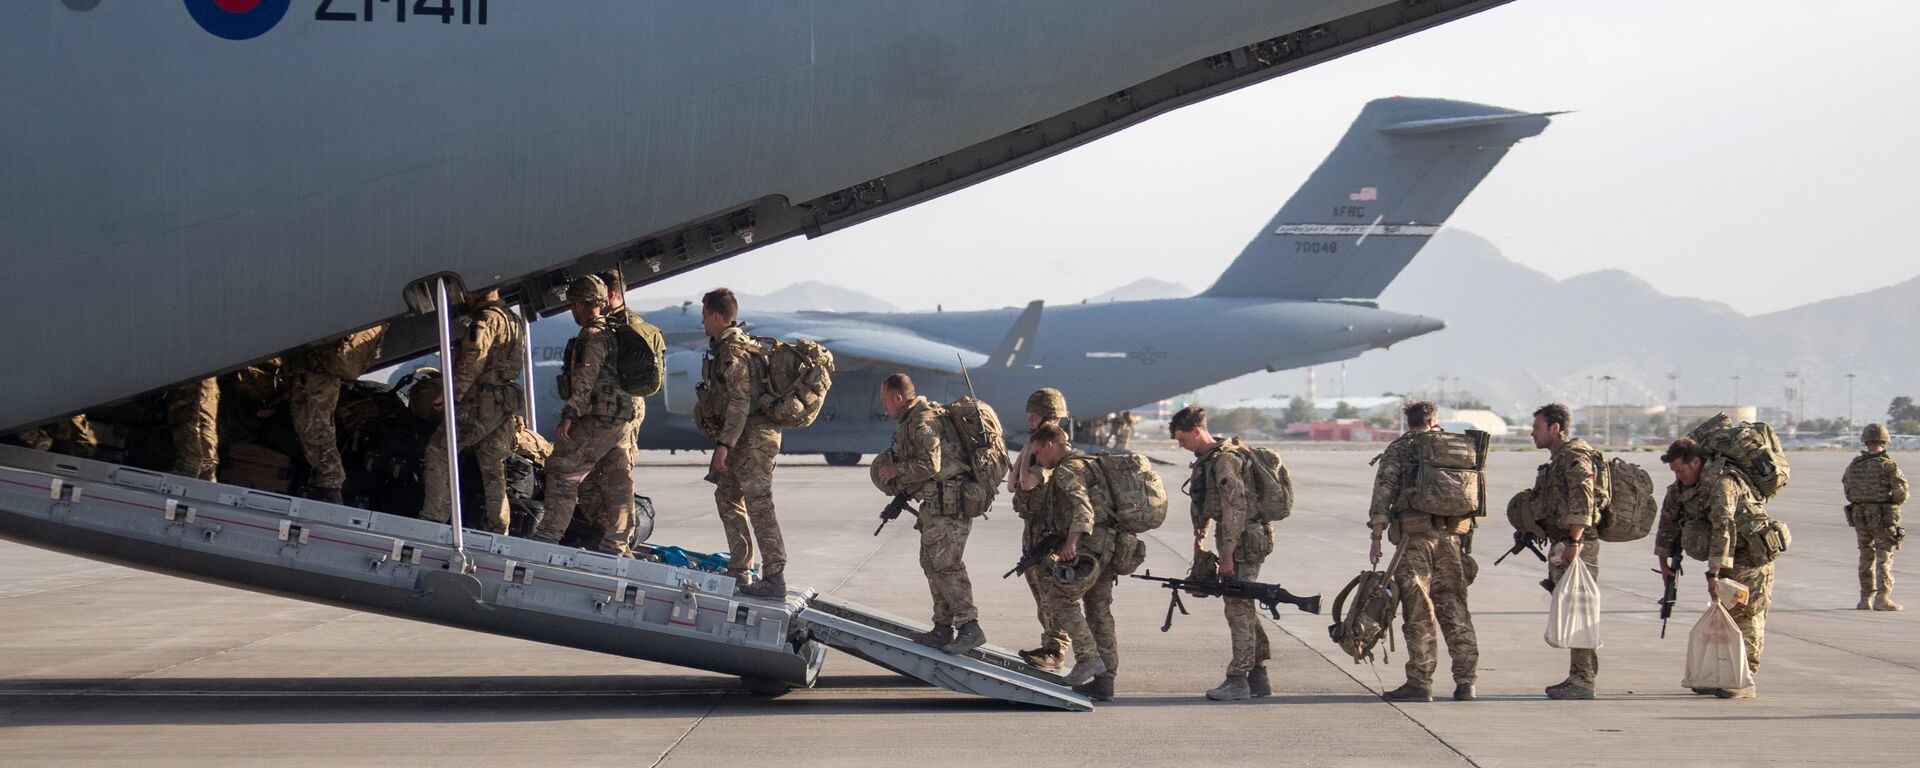 UK military personnel board an A400M aircraft departing Kabul, Afghanistan August 28, 2021 - Sputnik International, 1920